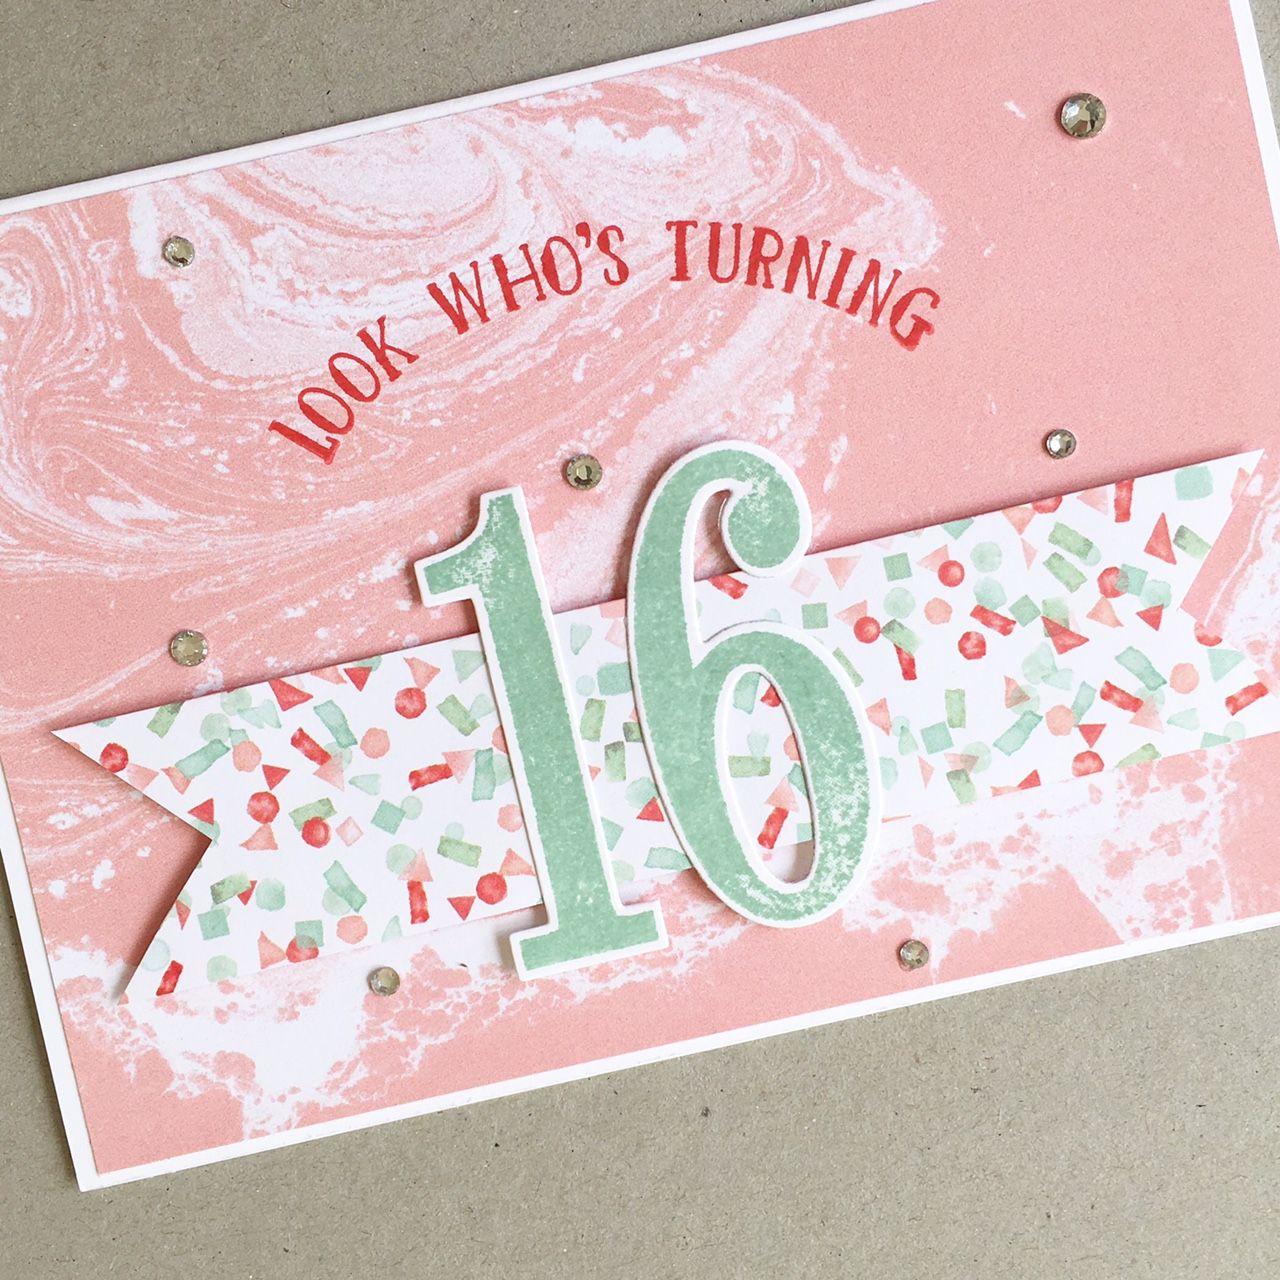 Sweet 16 Card Making Ideas Part - 16: 16th Birthday Card #handmade #card #cardmaking #cardclasses #sydney  #forsale #